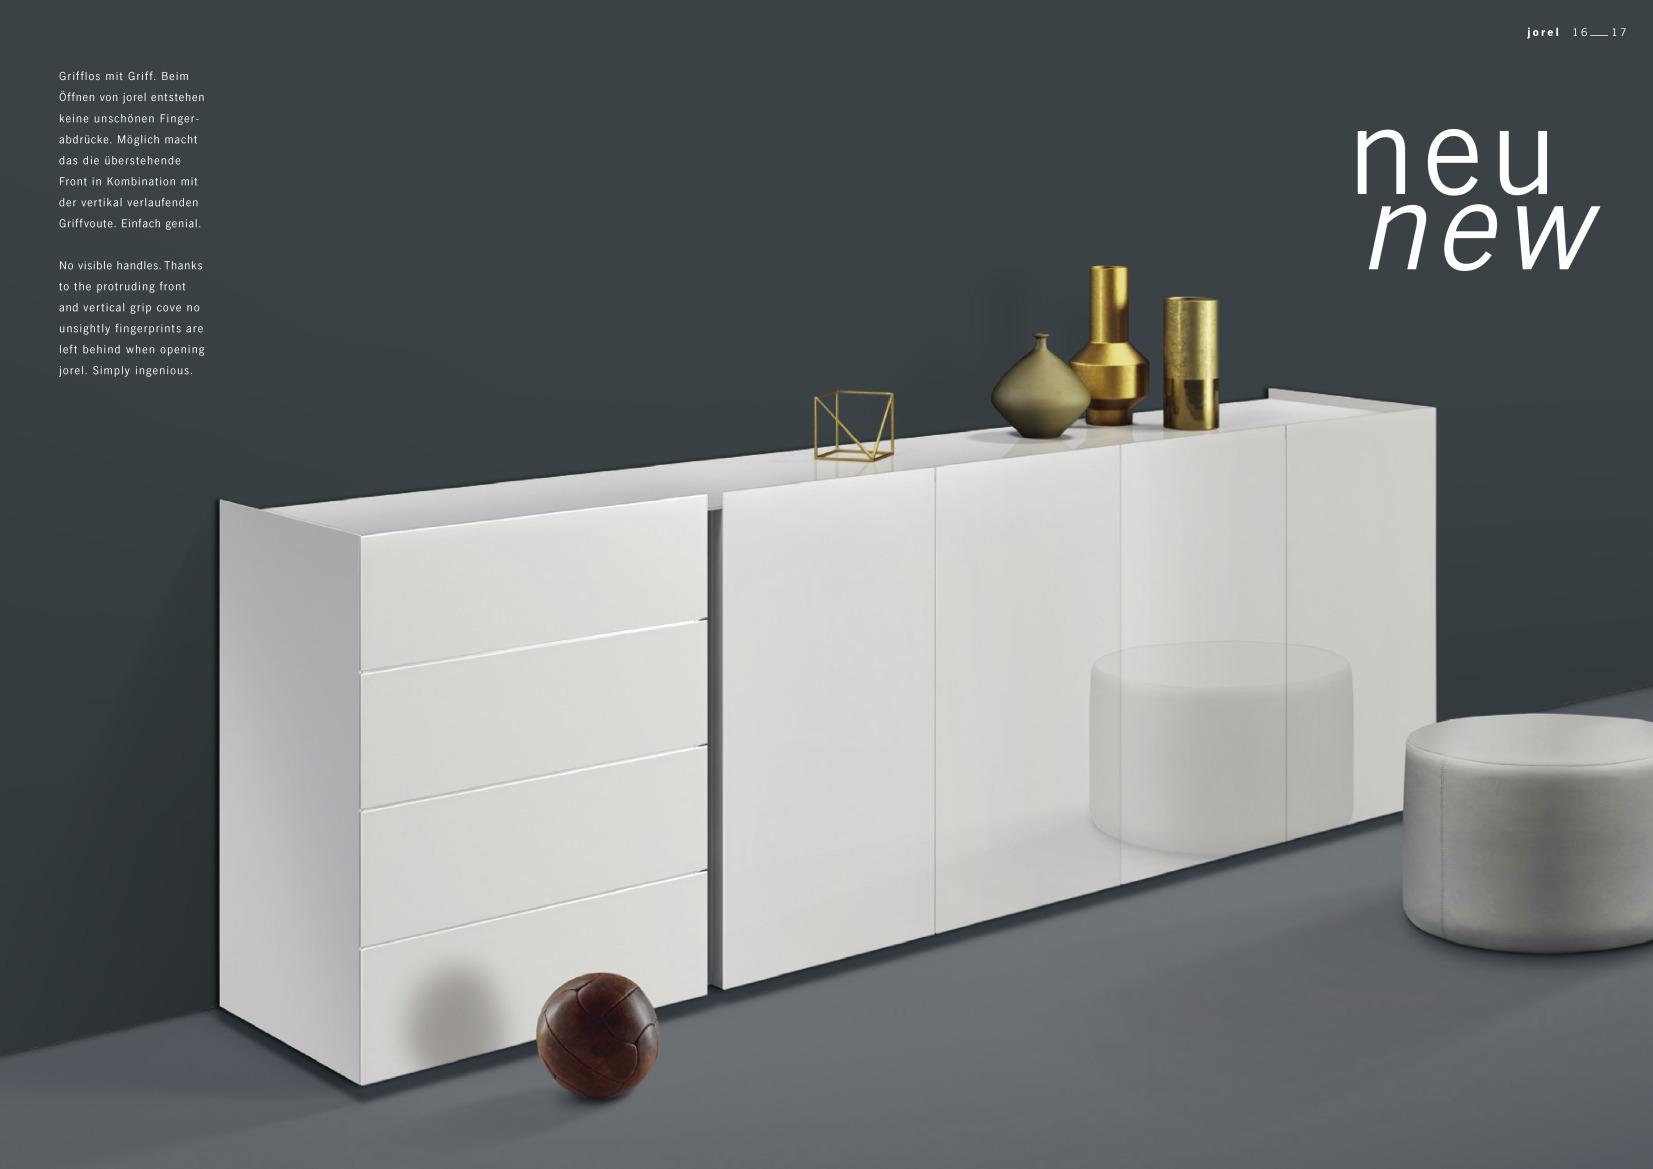 interluebke lookbook 2017 gs 7 m bel weber neustadt landau karlsruhe. Black Bedroom Furniture Sets. Home Design Ideas